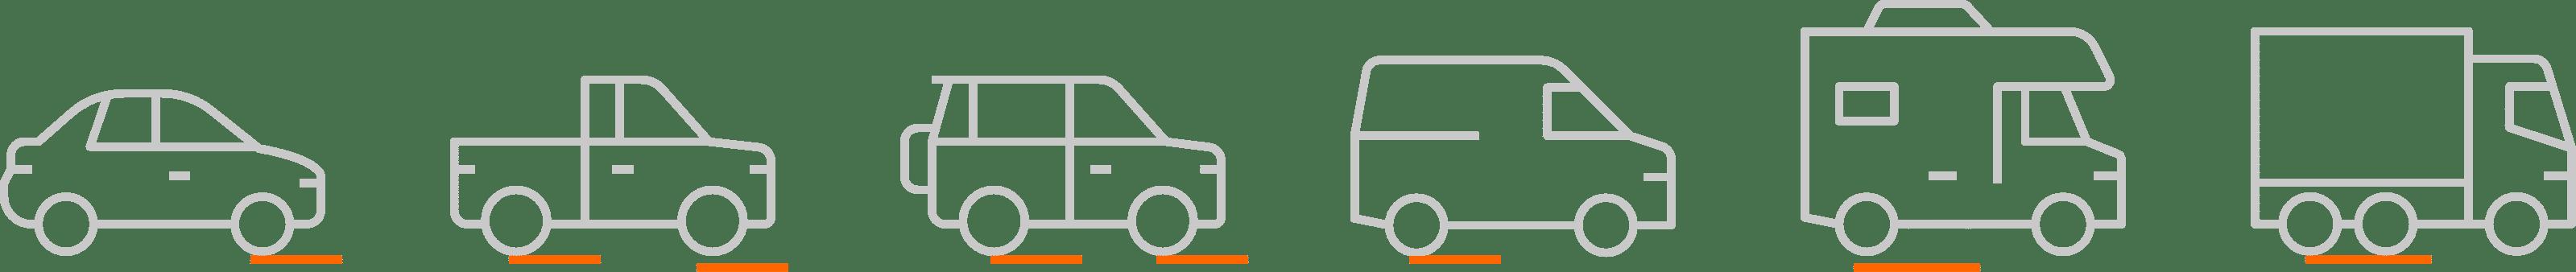 Line of vehicle illustrations using GoTreads